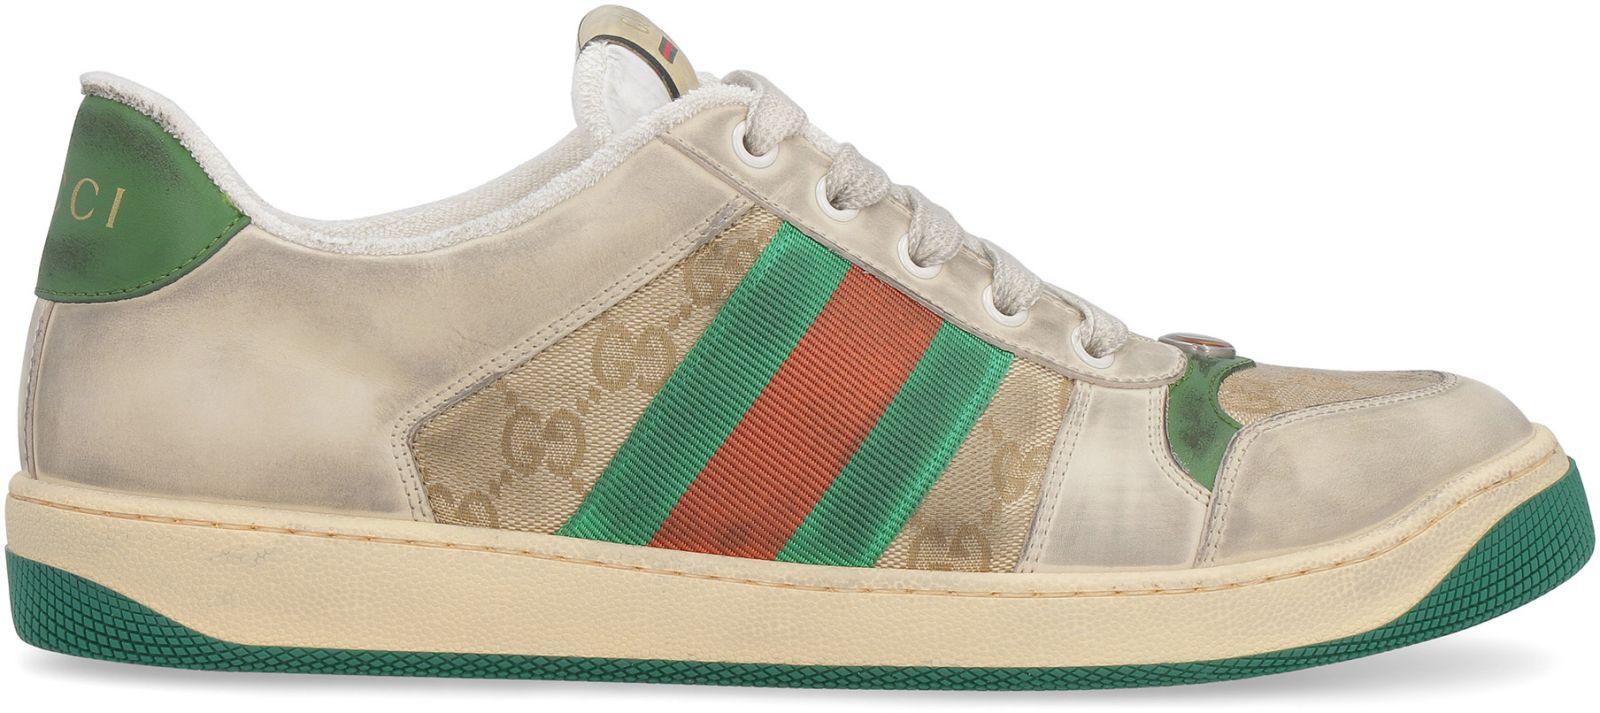 7dcf6d8bba4 Gucci Gucci Screener Gg Low-top Sneakers - Beige - 10879574